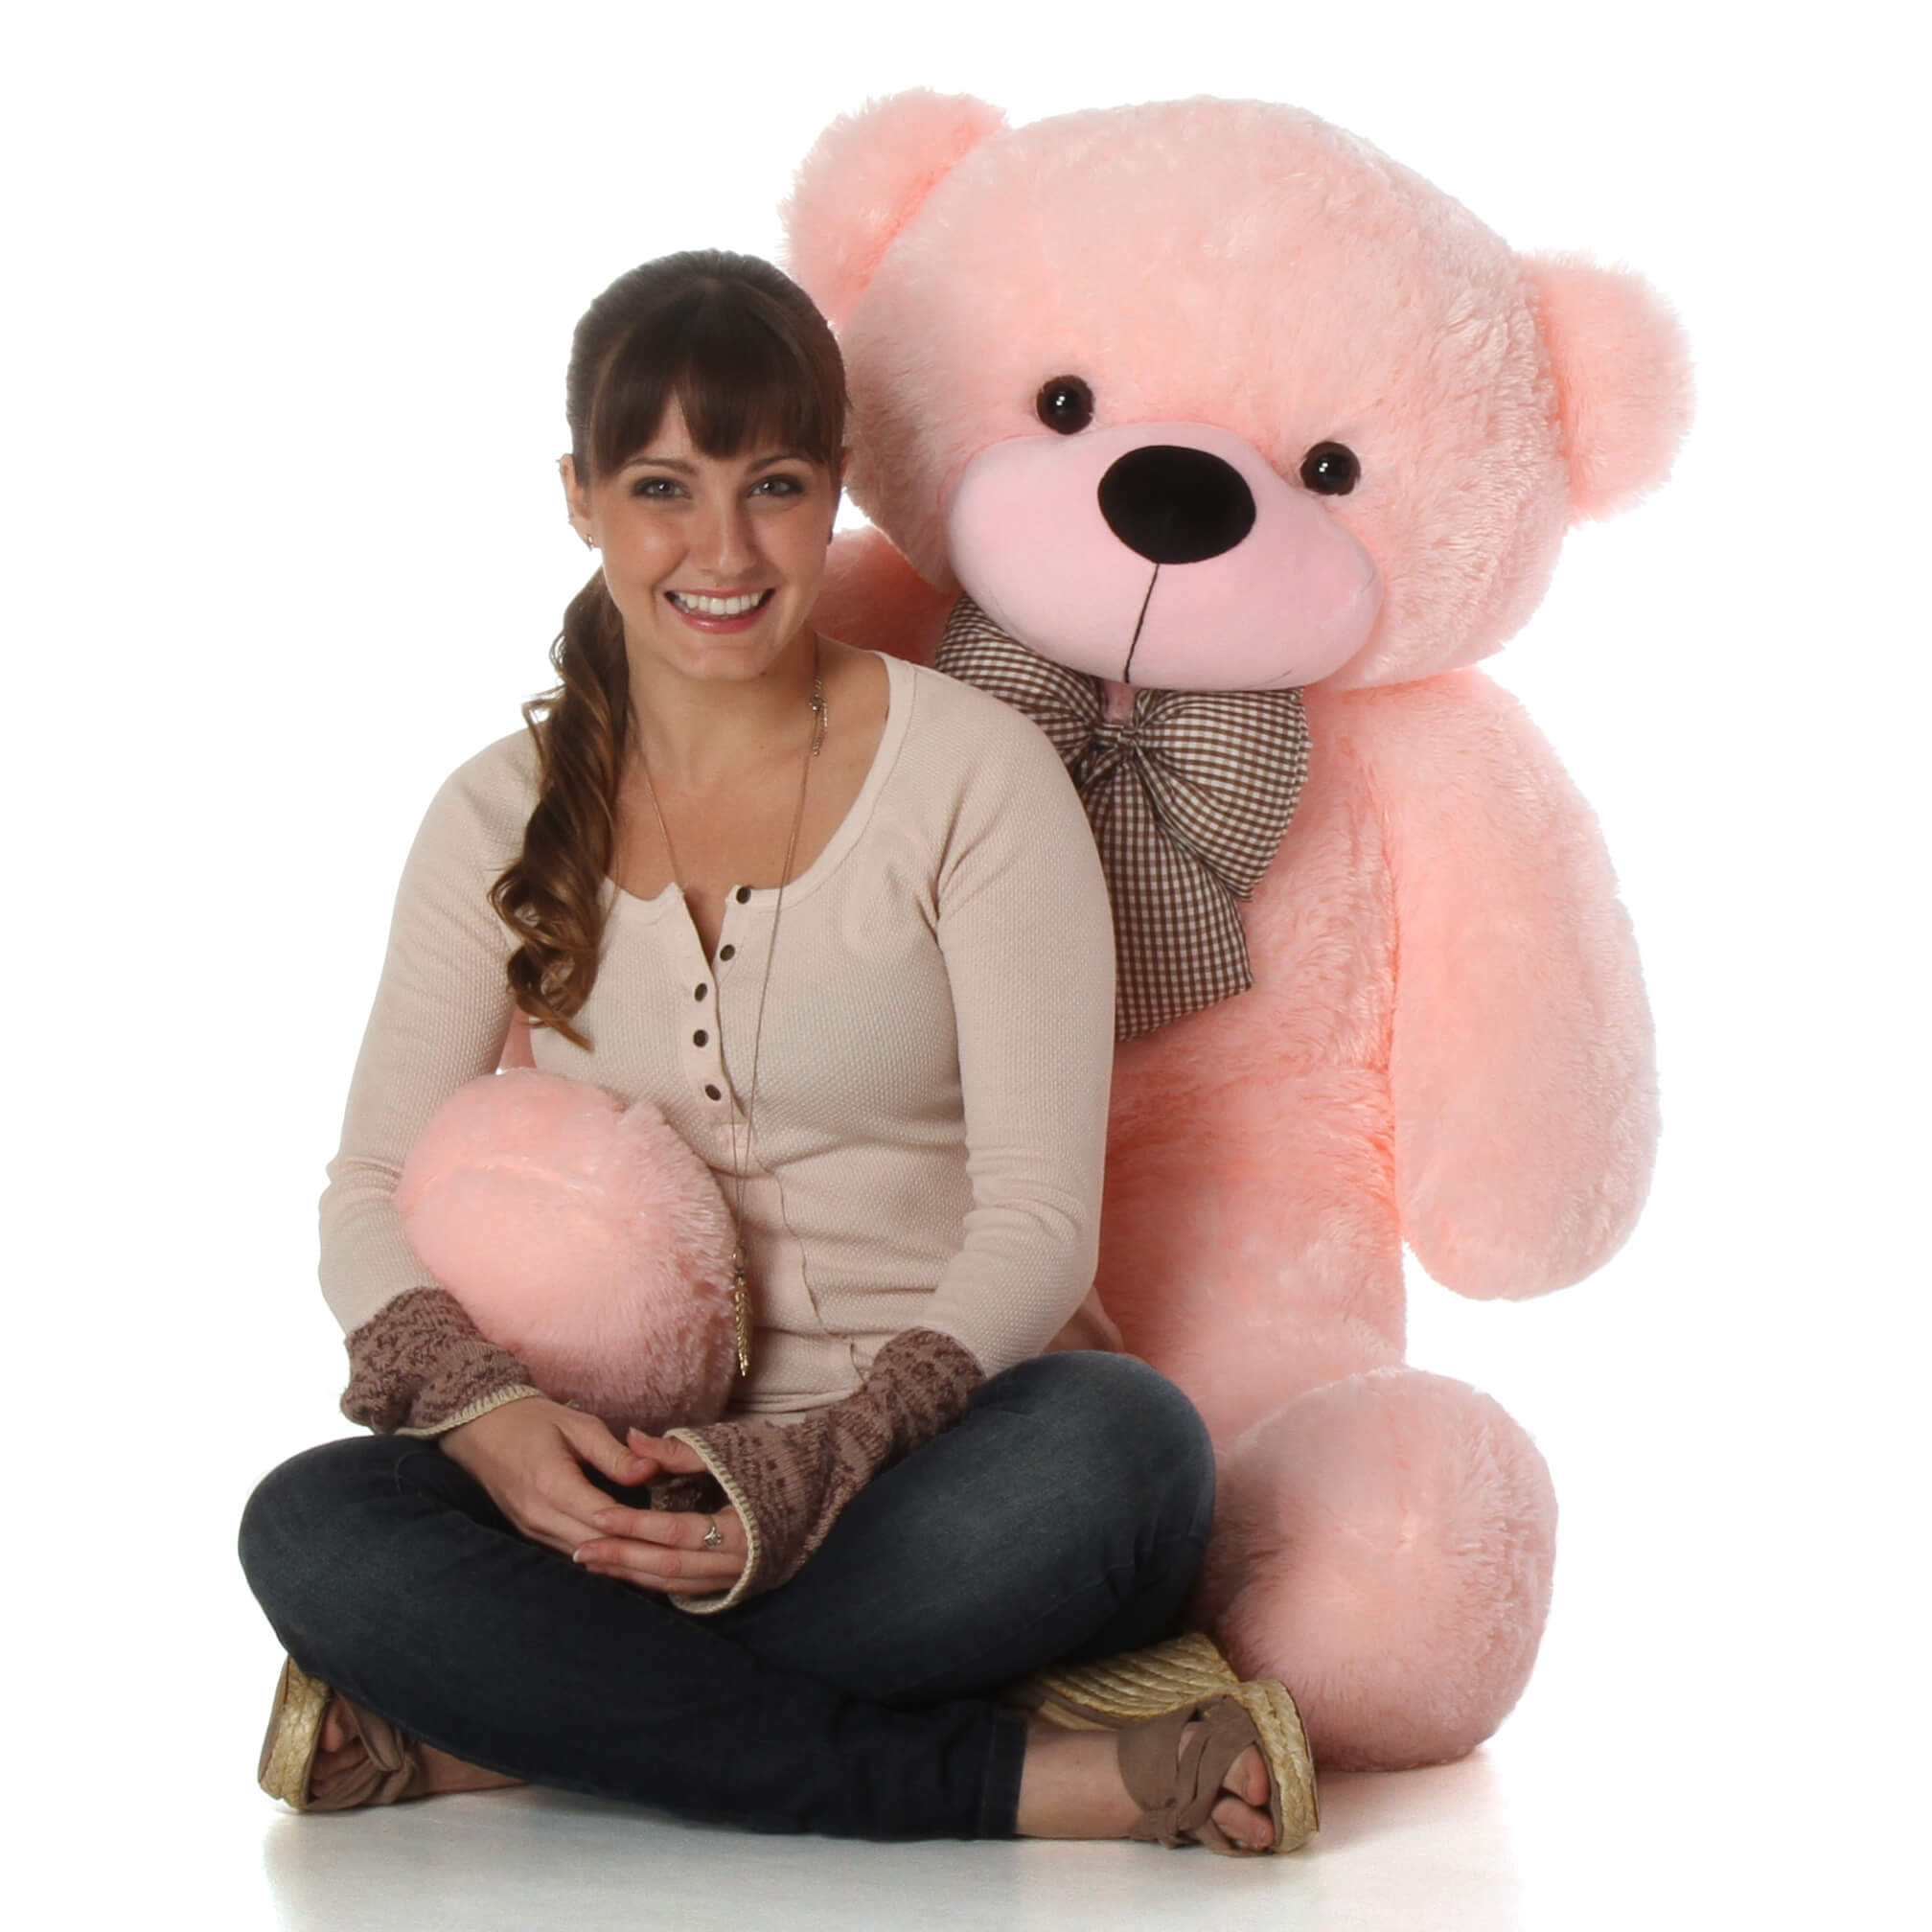 48in-lady-cuddles-super-soft-huggable-pink-teddy-bear-1.jpg